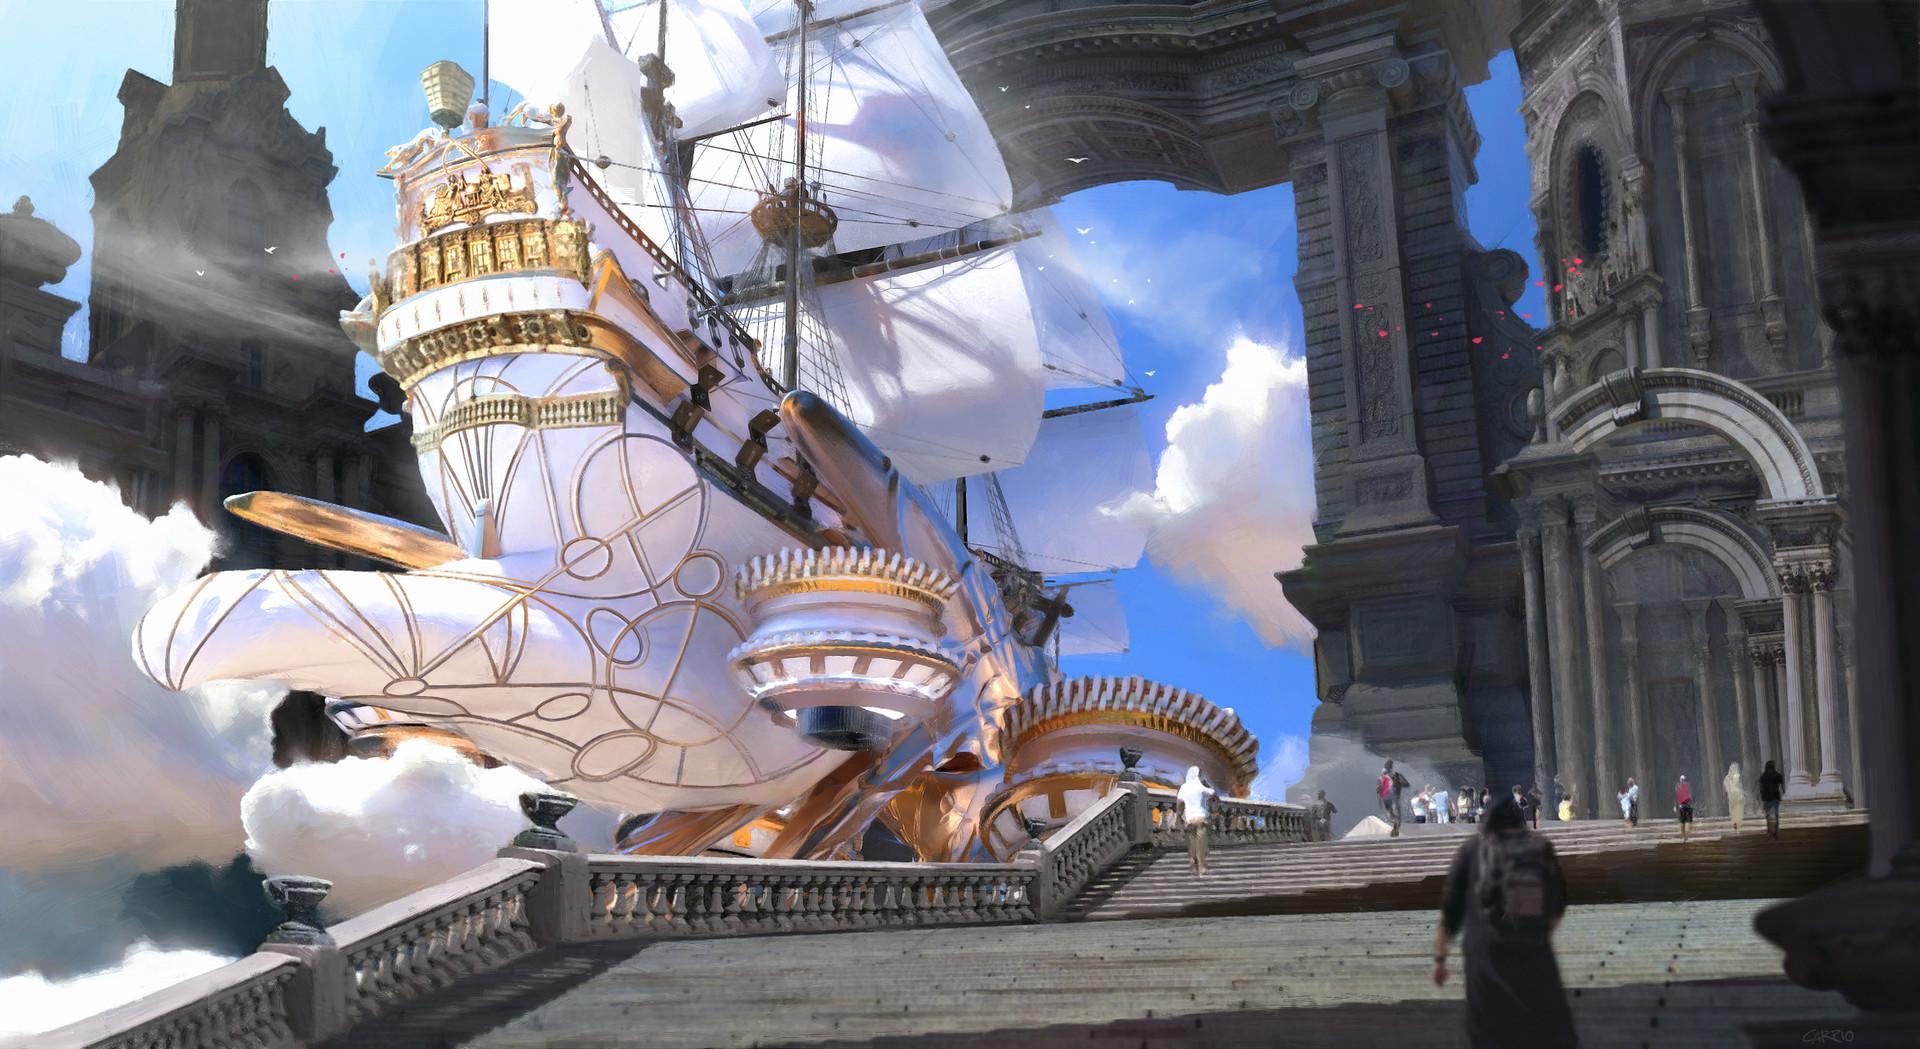 Pablo carpio ship